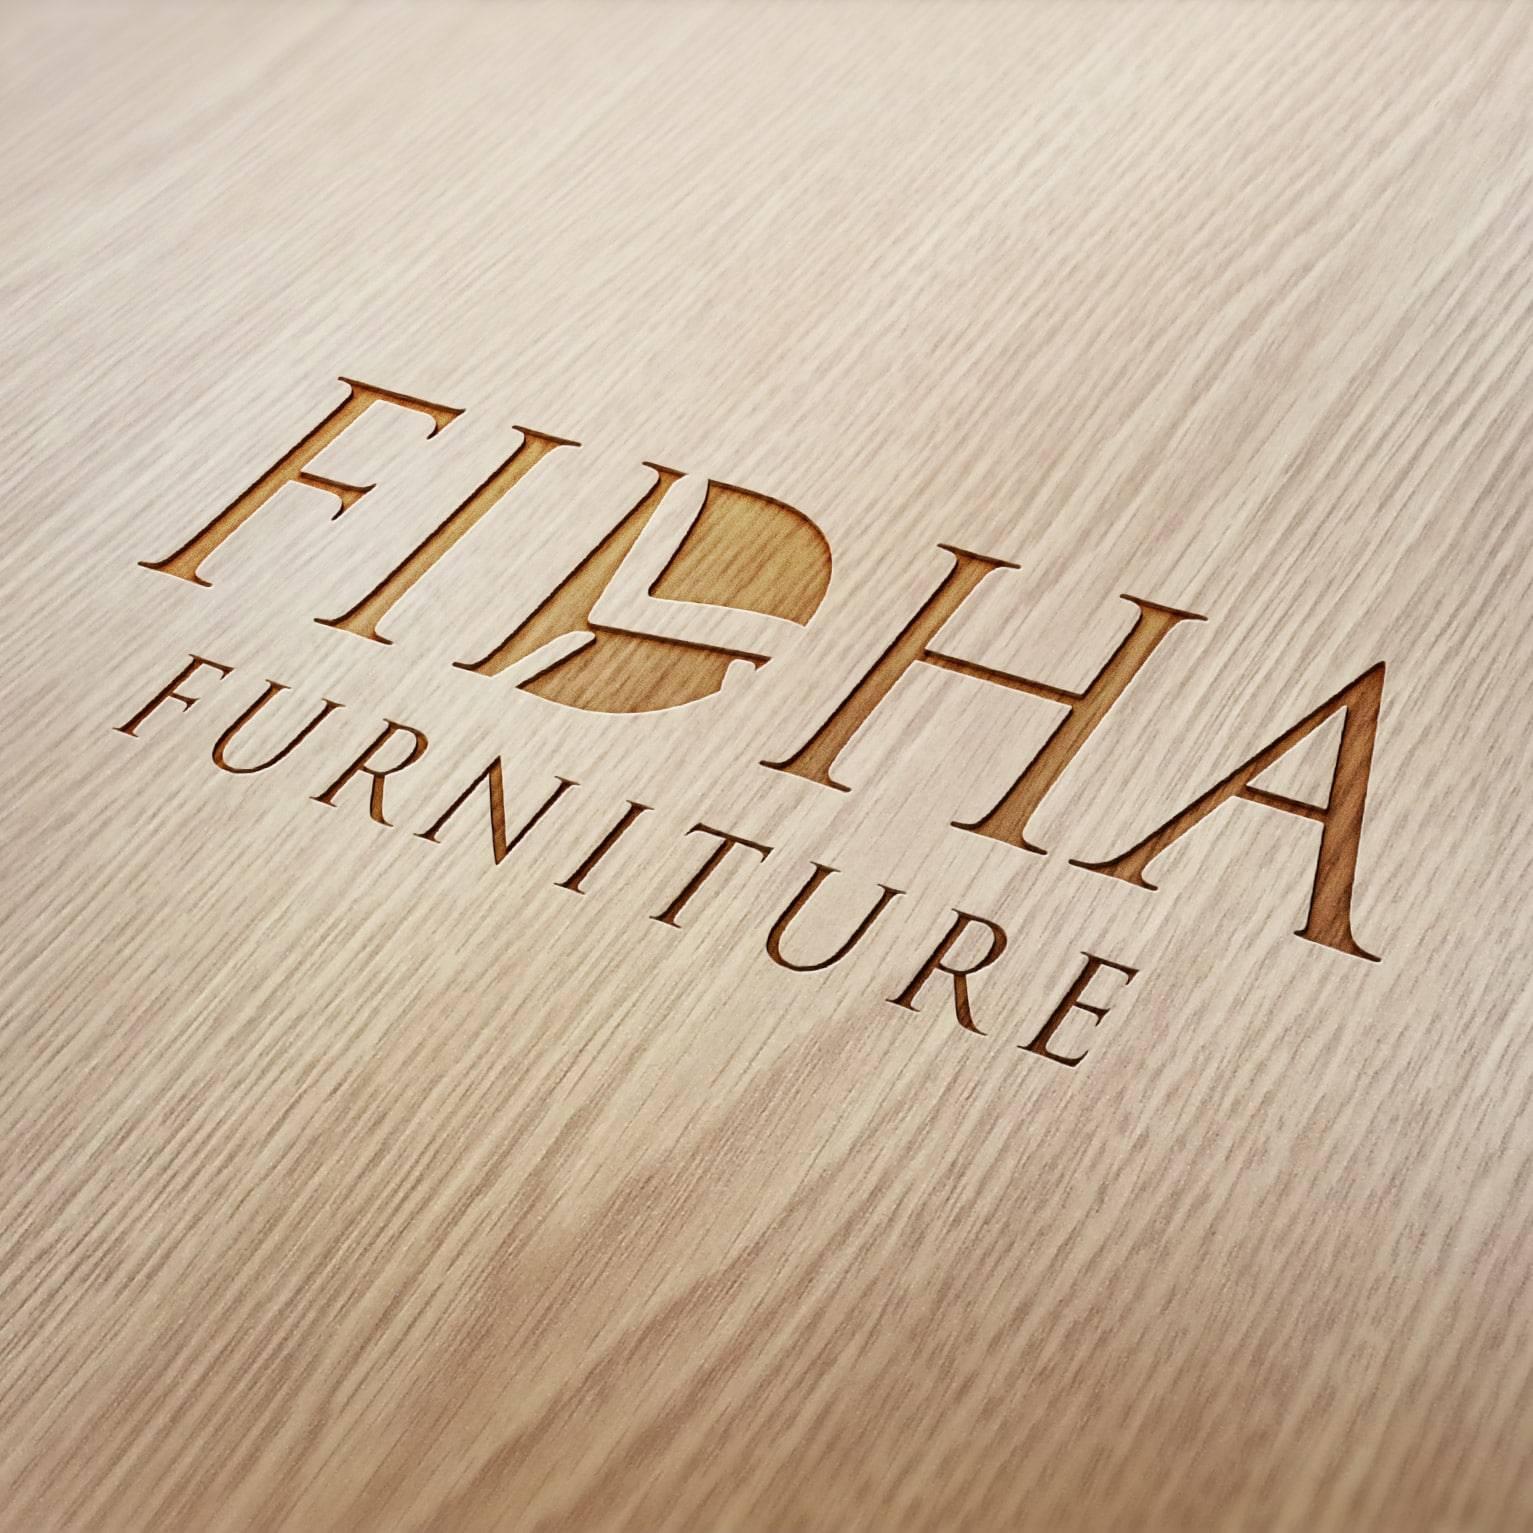 Furniture shop branding